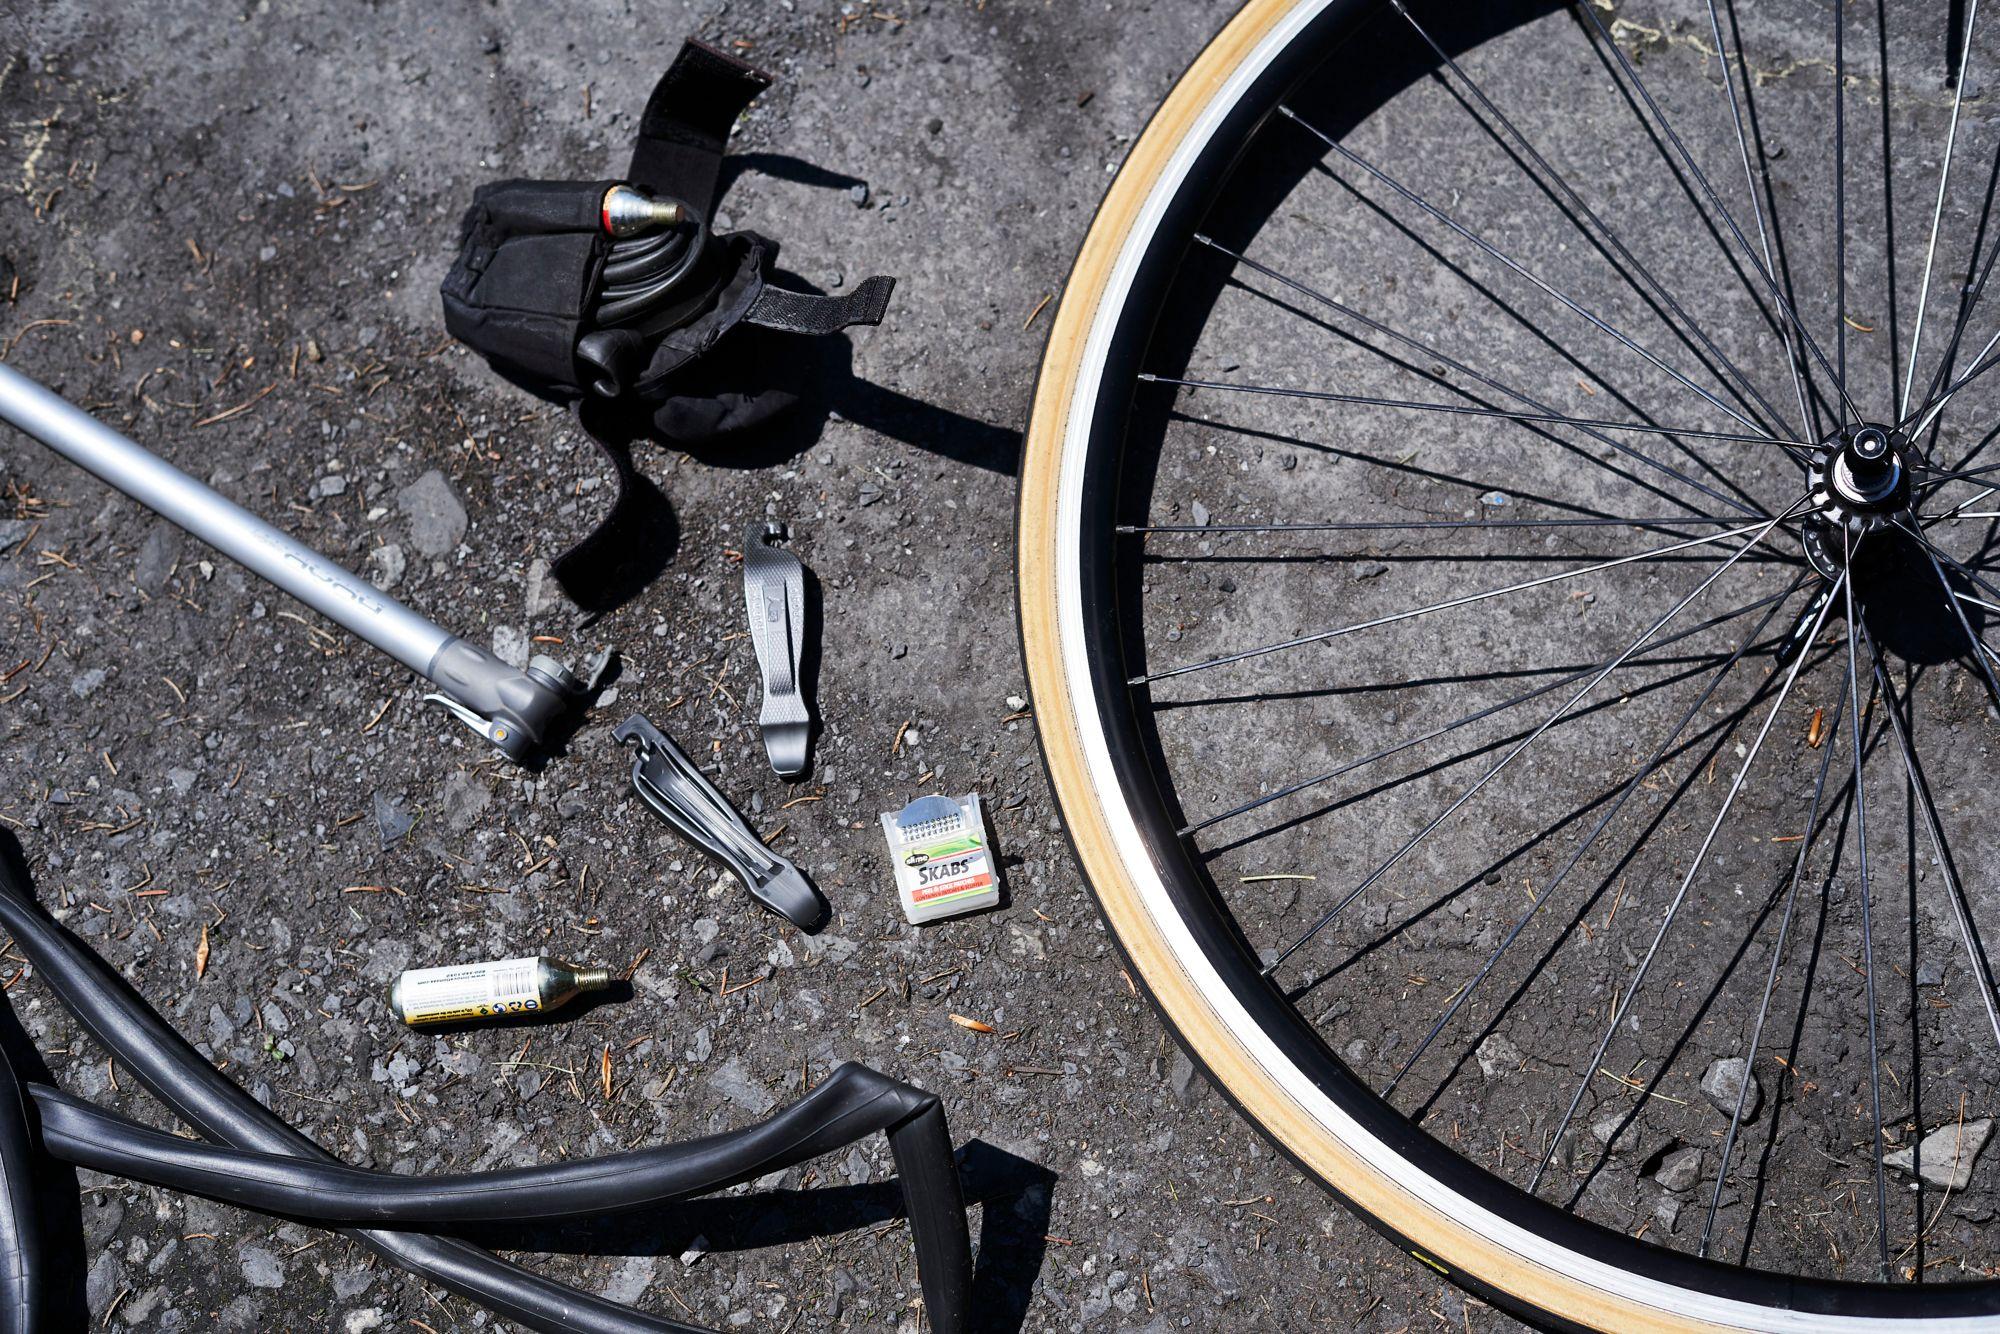 How to Change a Bike Tire | How to Fix a Flat Tire on Bike